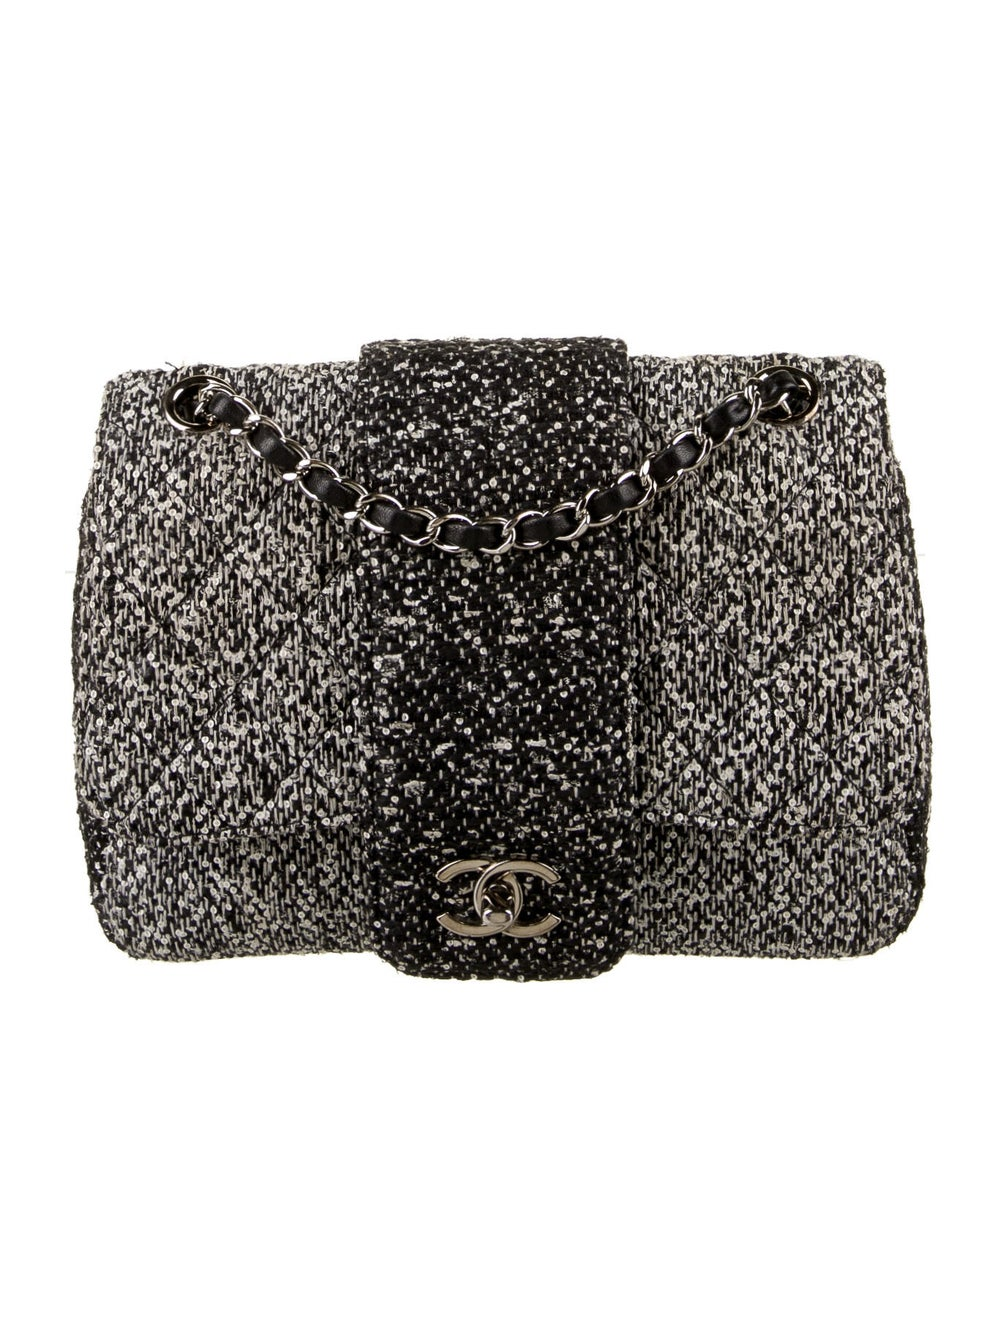 Chanel Tweed Elementary Chic Flap Bag Black - image 1